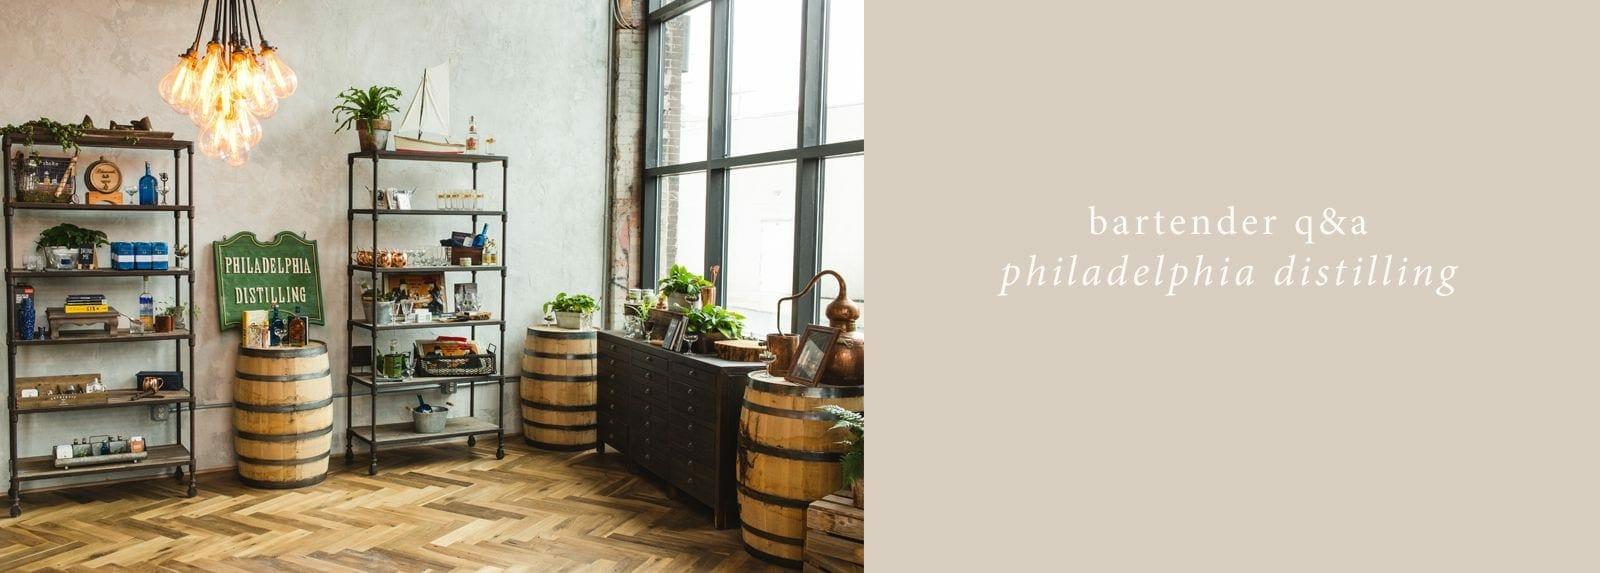 philadelphia distilling bartender q&a hero